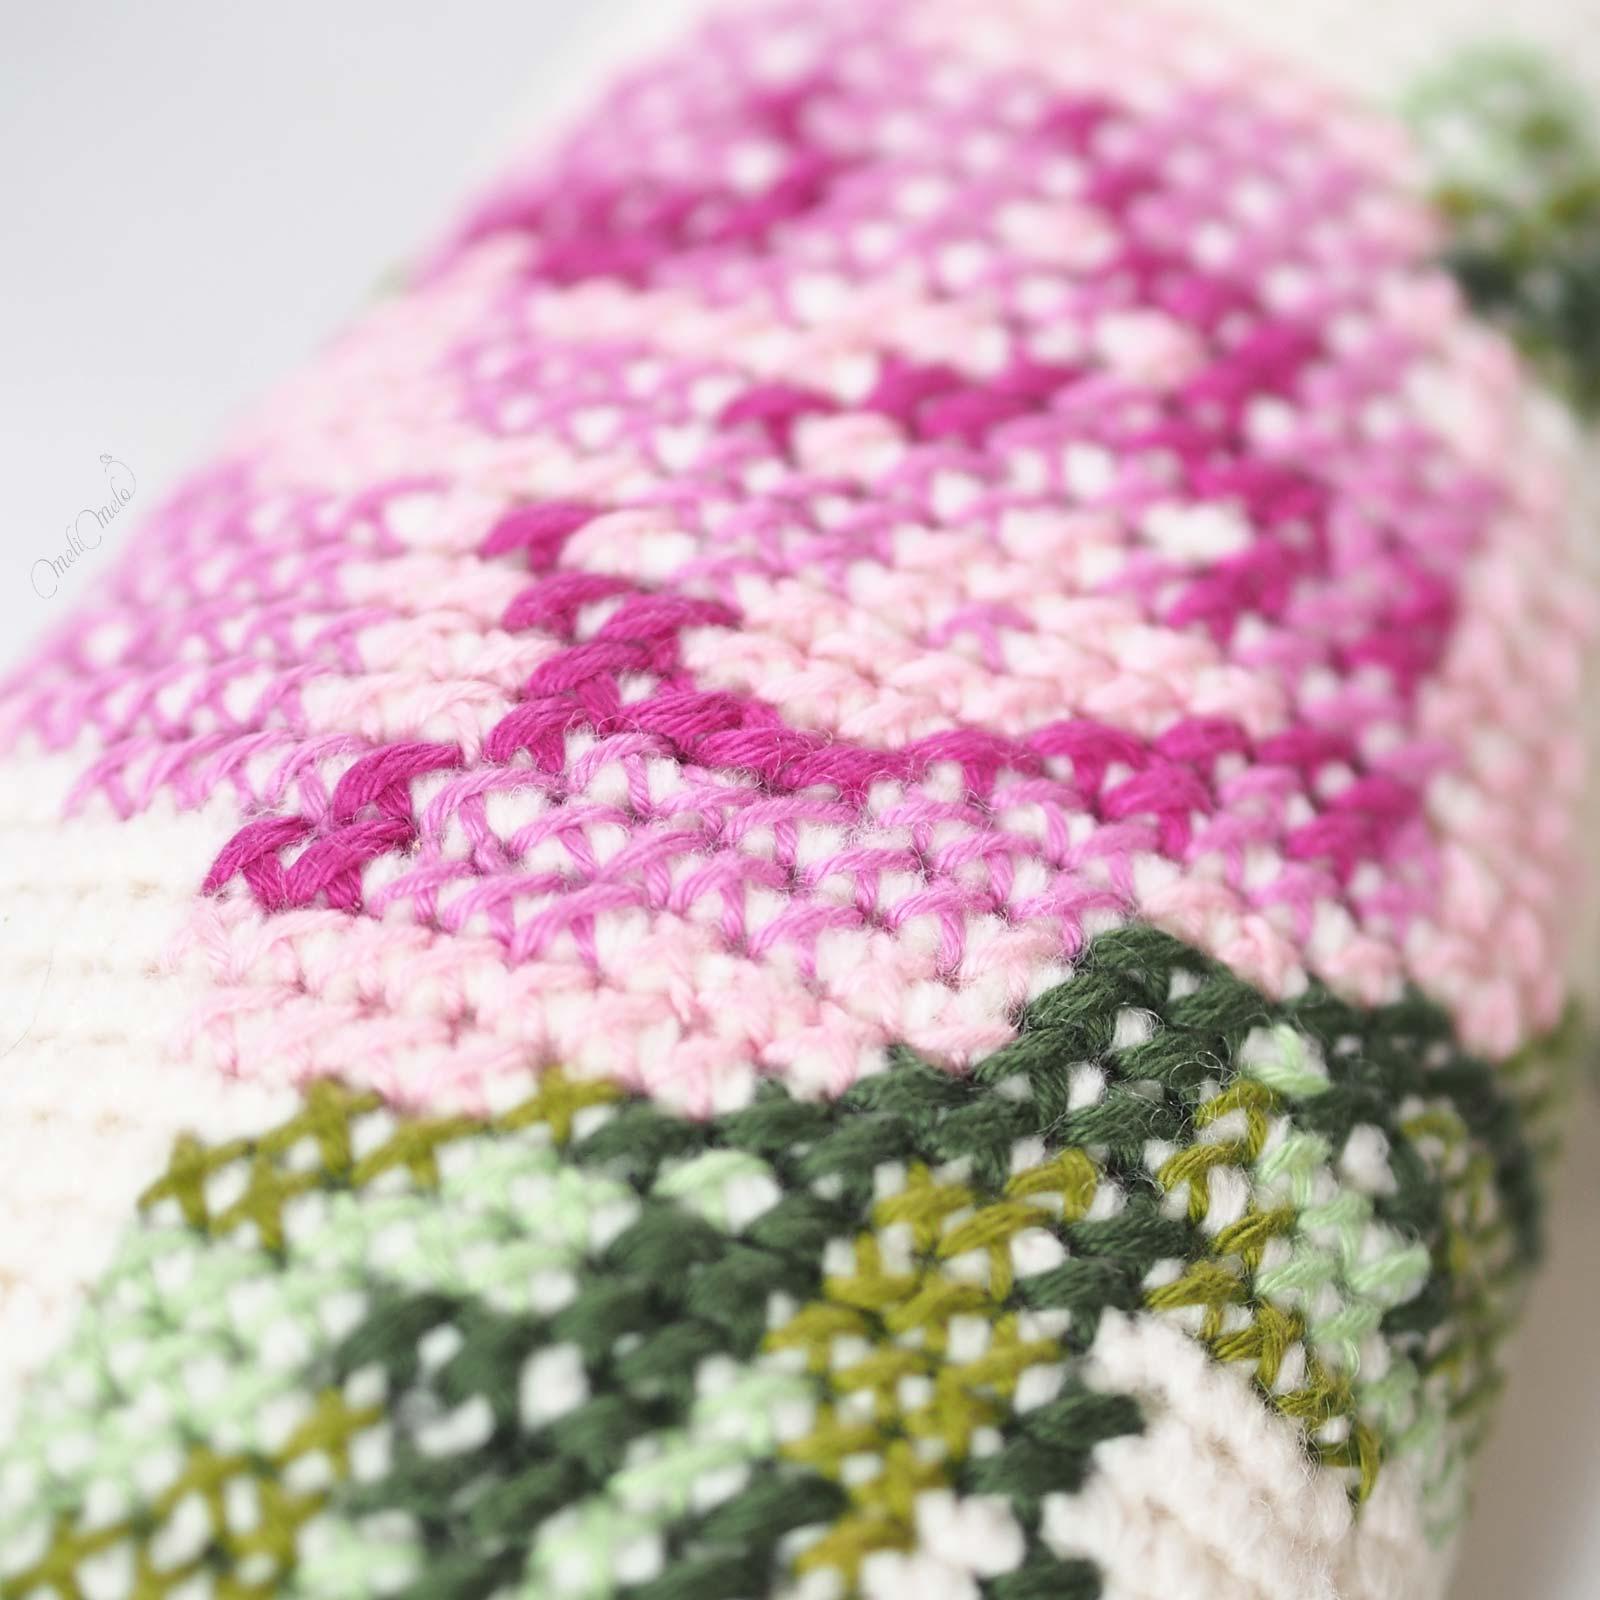 crochet lapin bunny rita Lalylala détail rose brodée laine alpaca chunky ricodesign laboutiquedemelimelo